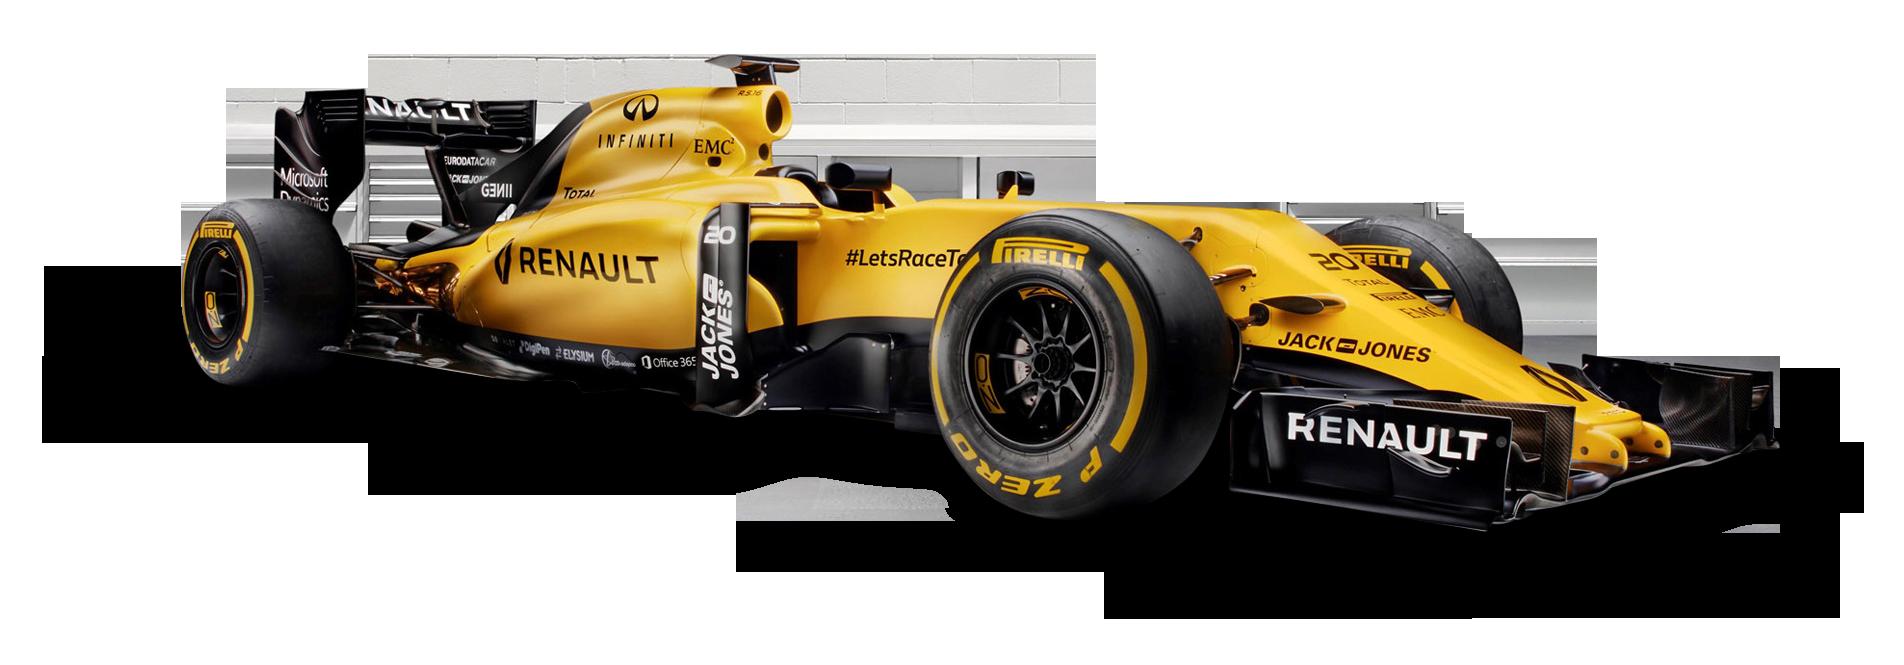 Renault RS16 Formula 1 Race Car PNG Image